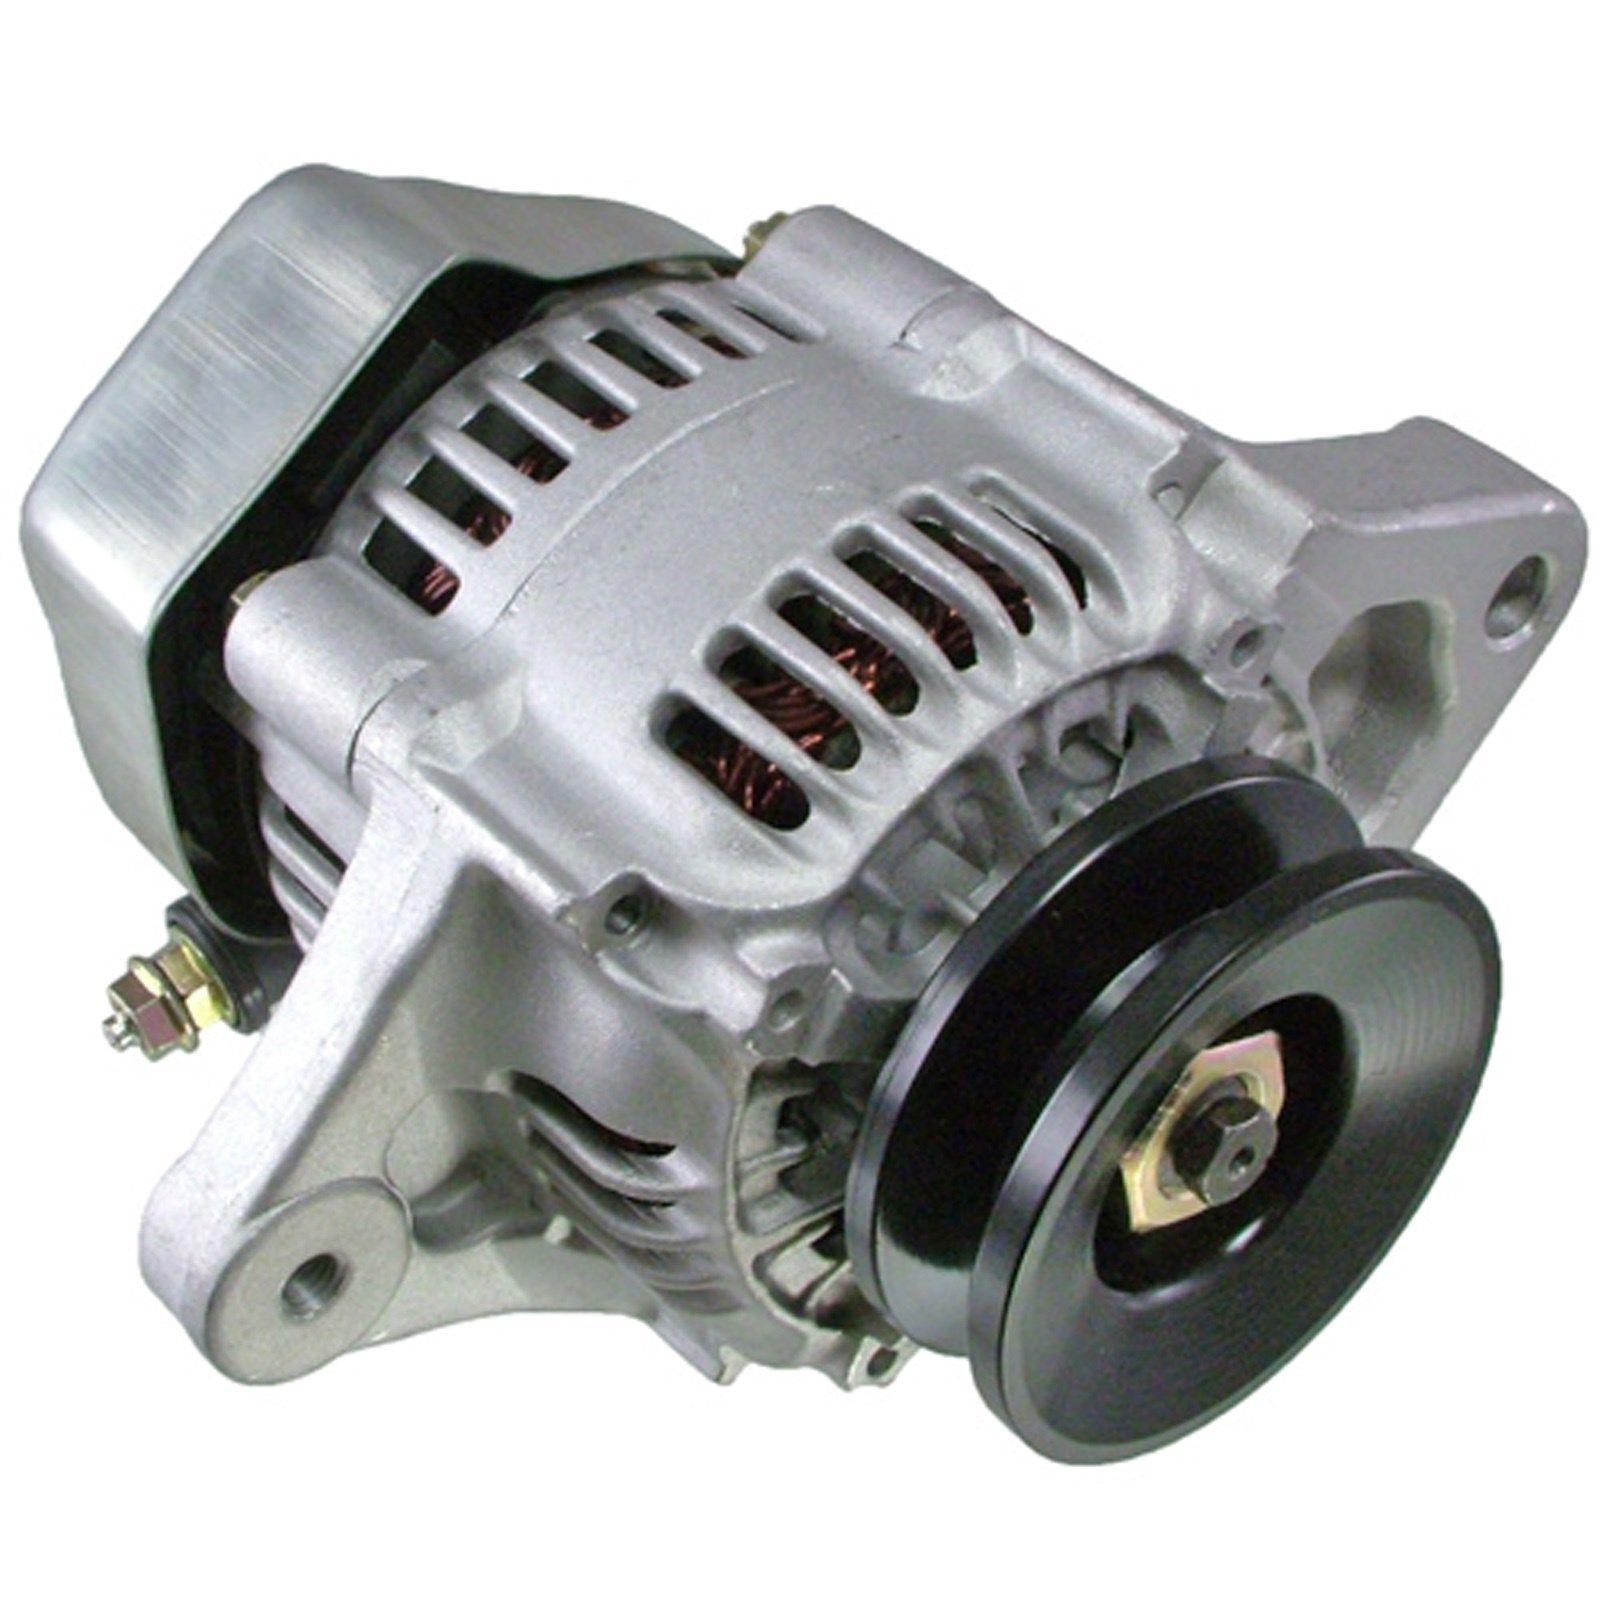 New Alternator For YANMAR Tractors Various Models 88-On 3TNA72 Engine, 119620-77201, 119620-77202